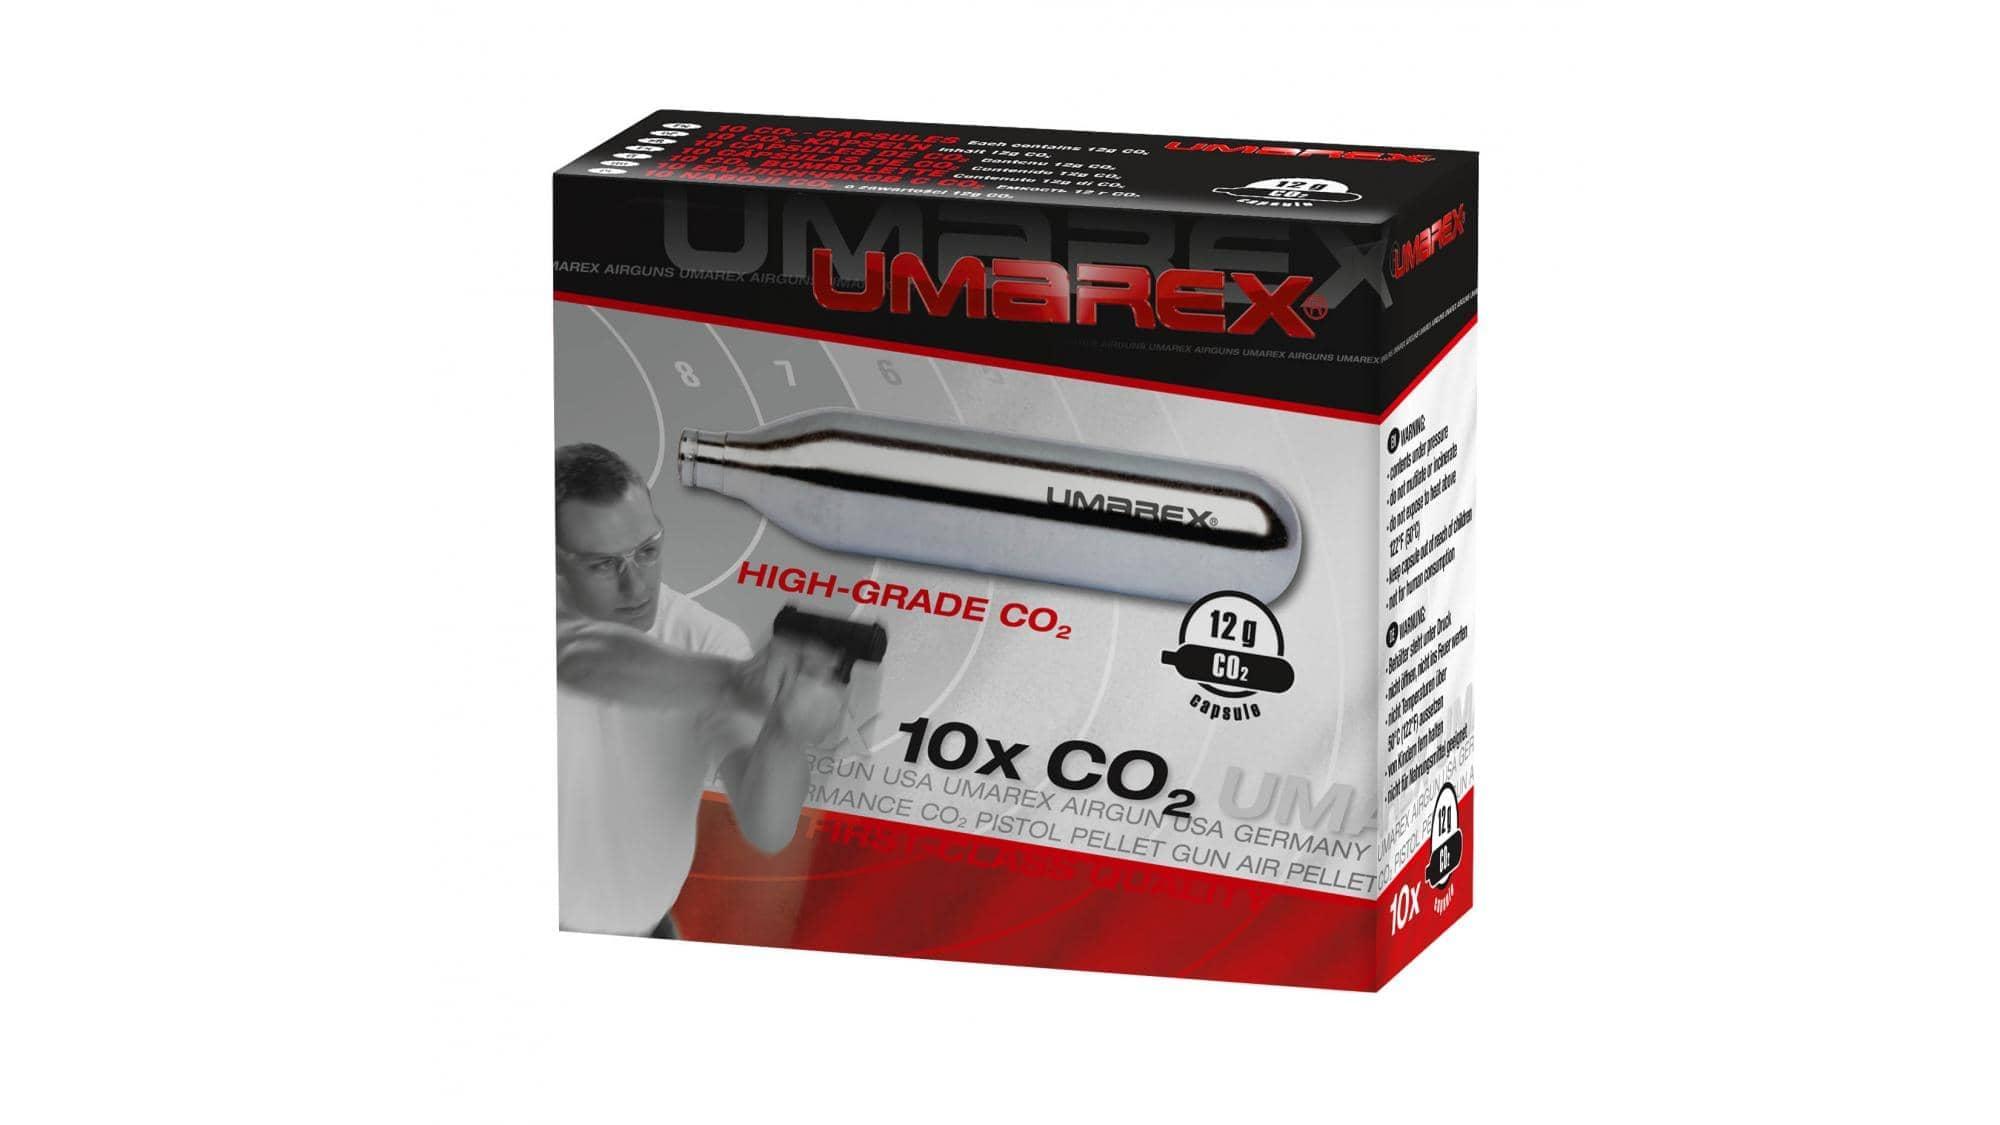 UMAREX 12g Co2-Kapseln